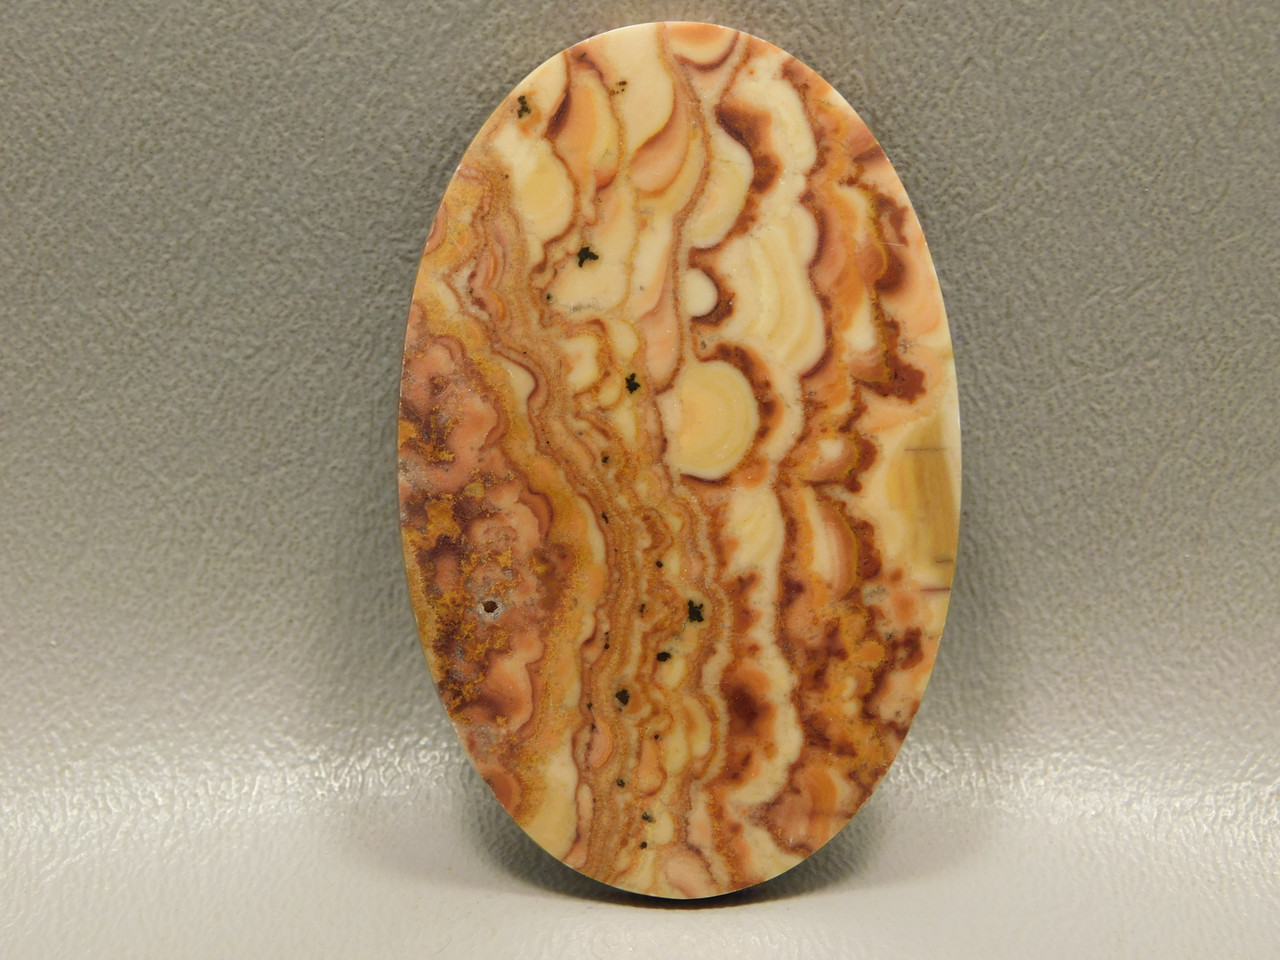 Wave Dolomite Large Oval Cabochon Stromatolite #4